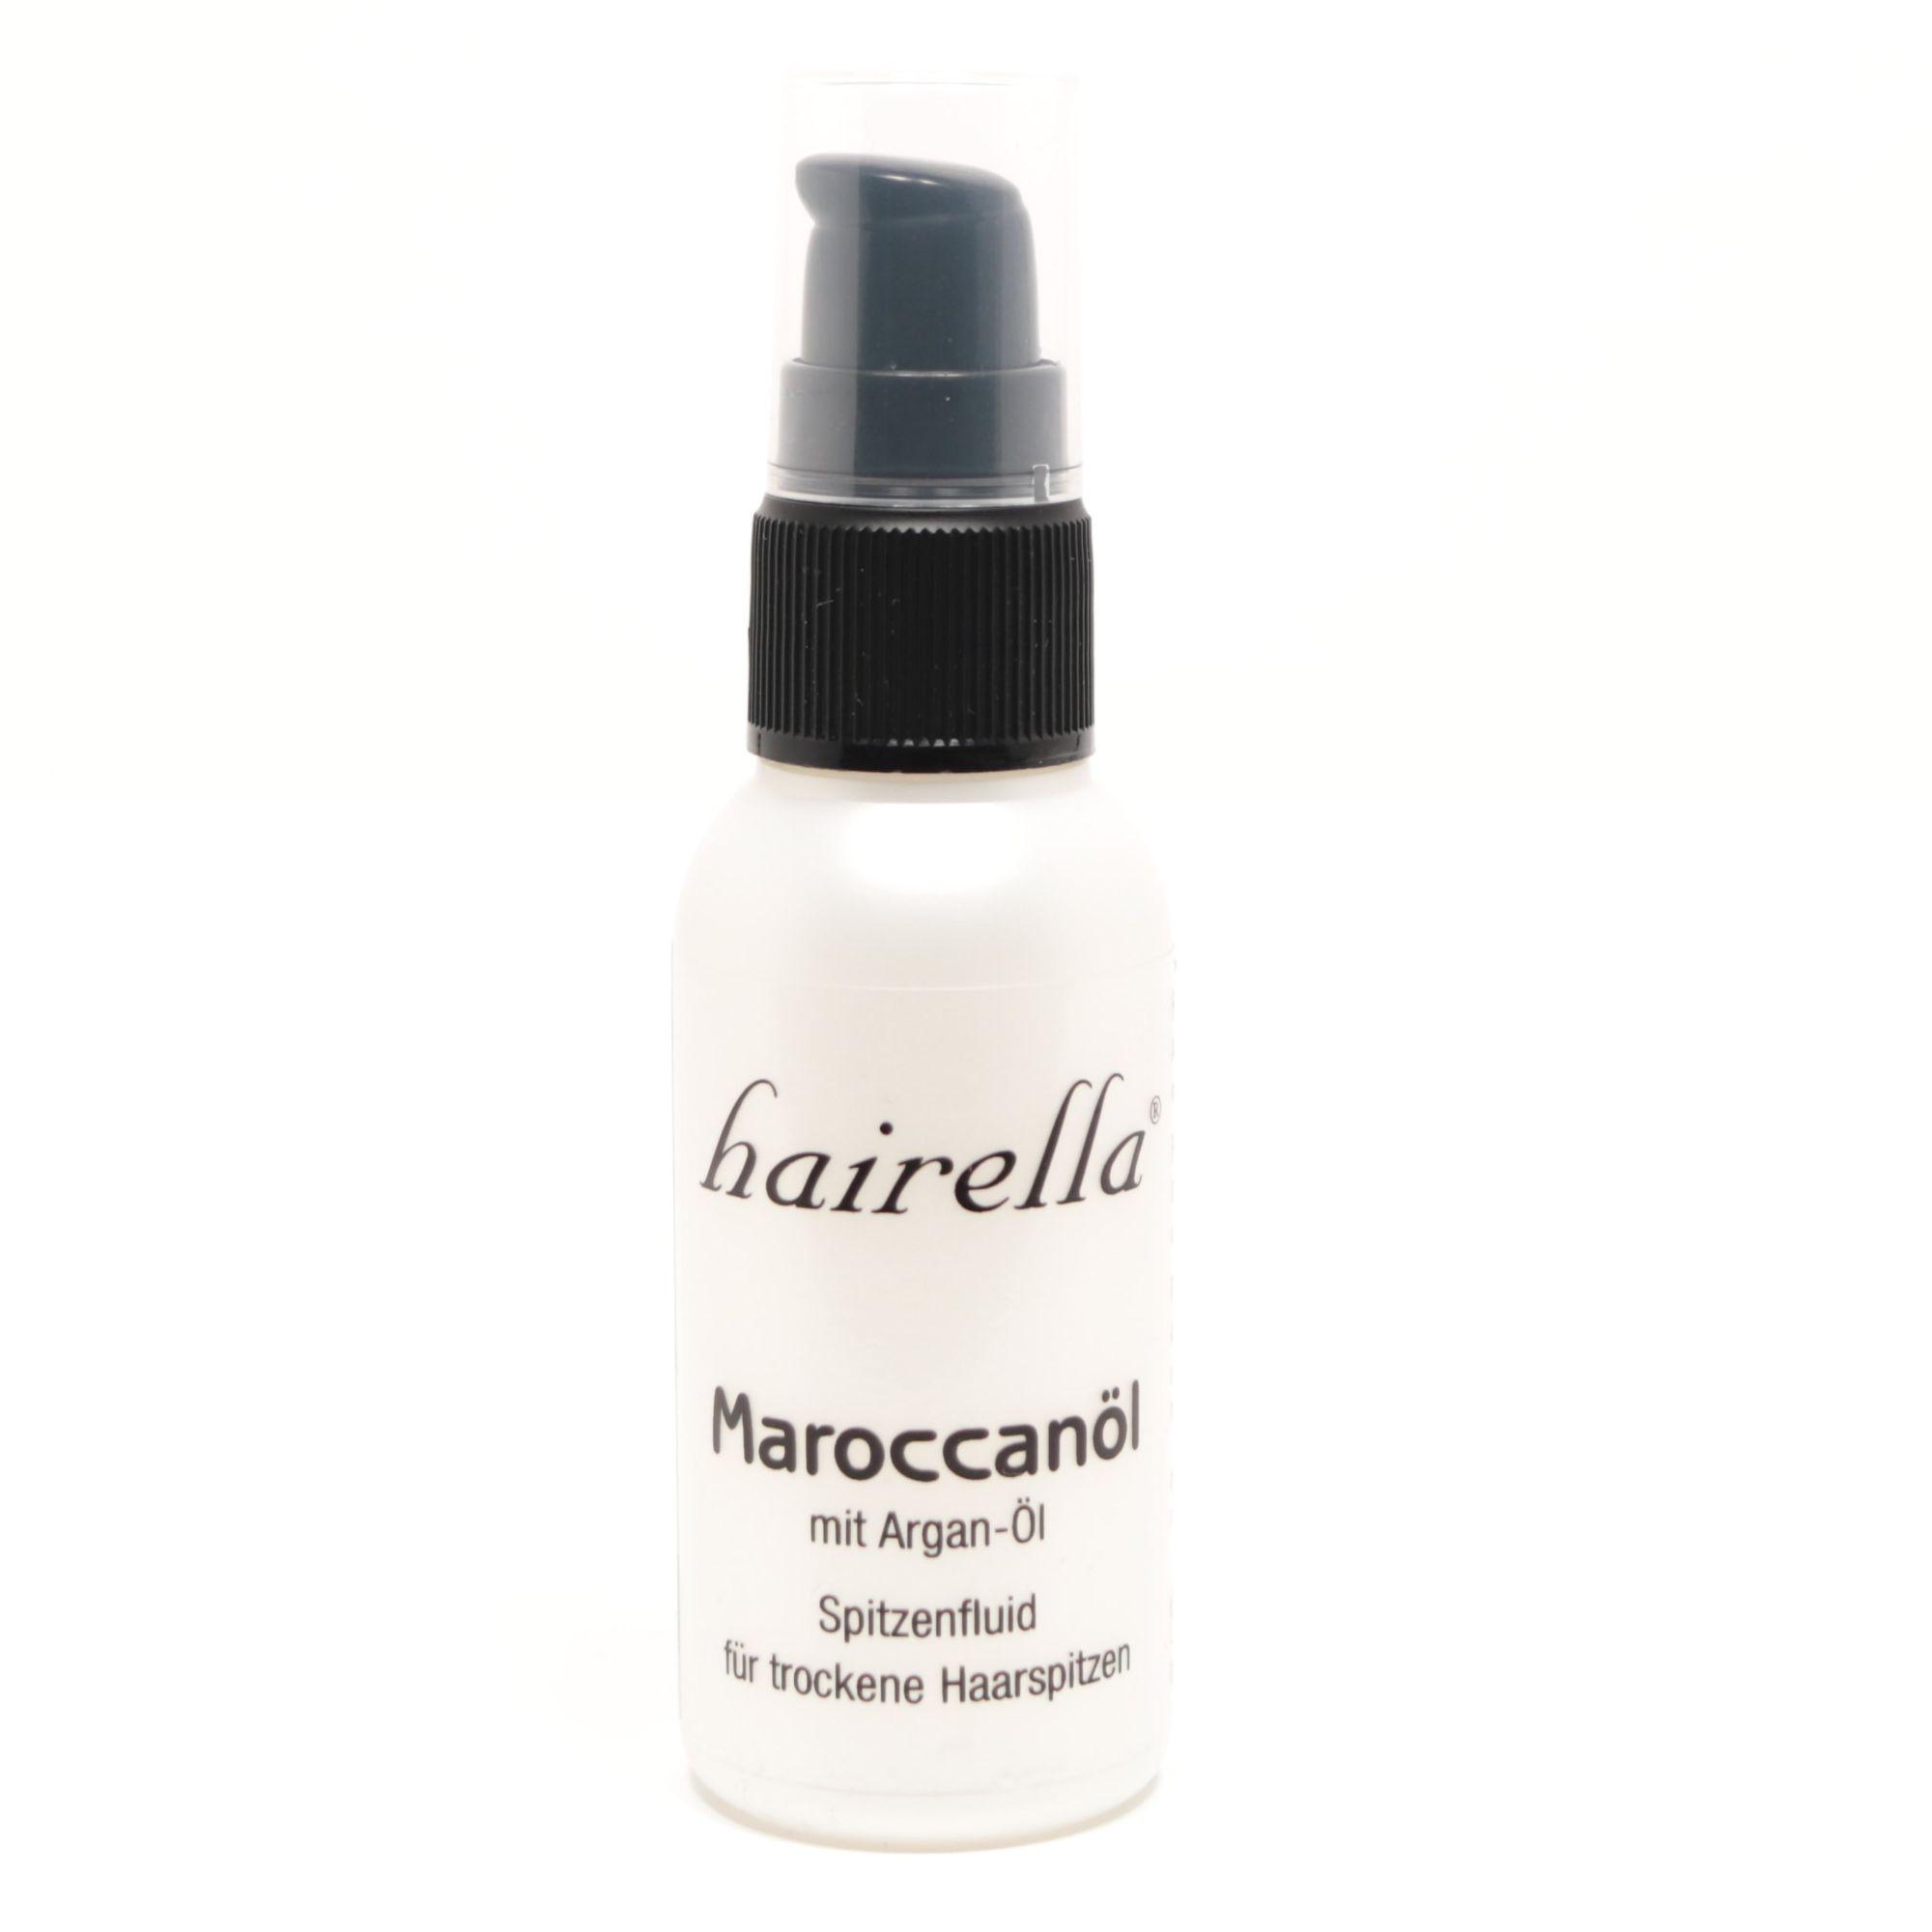 hairella Maroccan Öl - Spitzenfluid